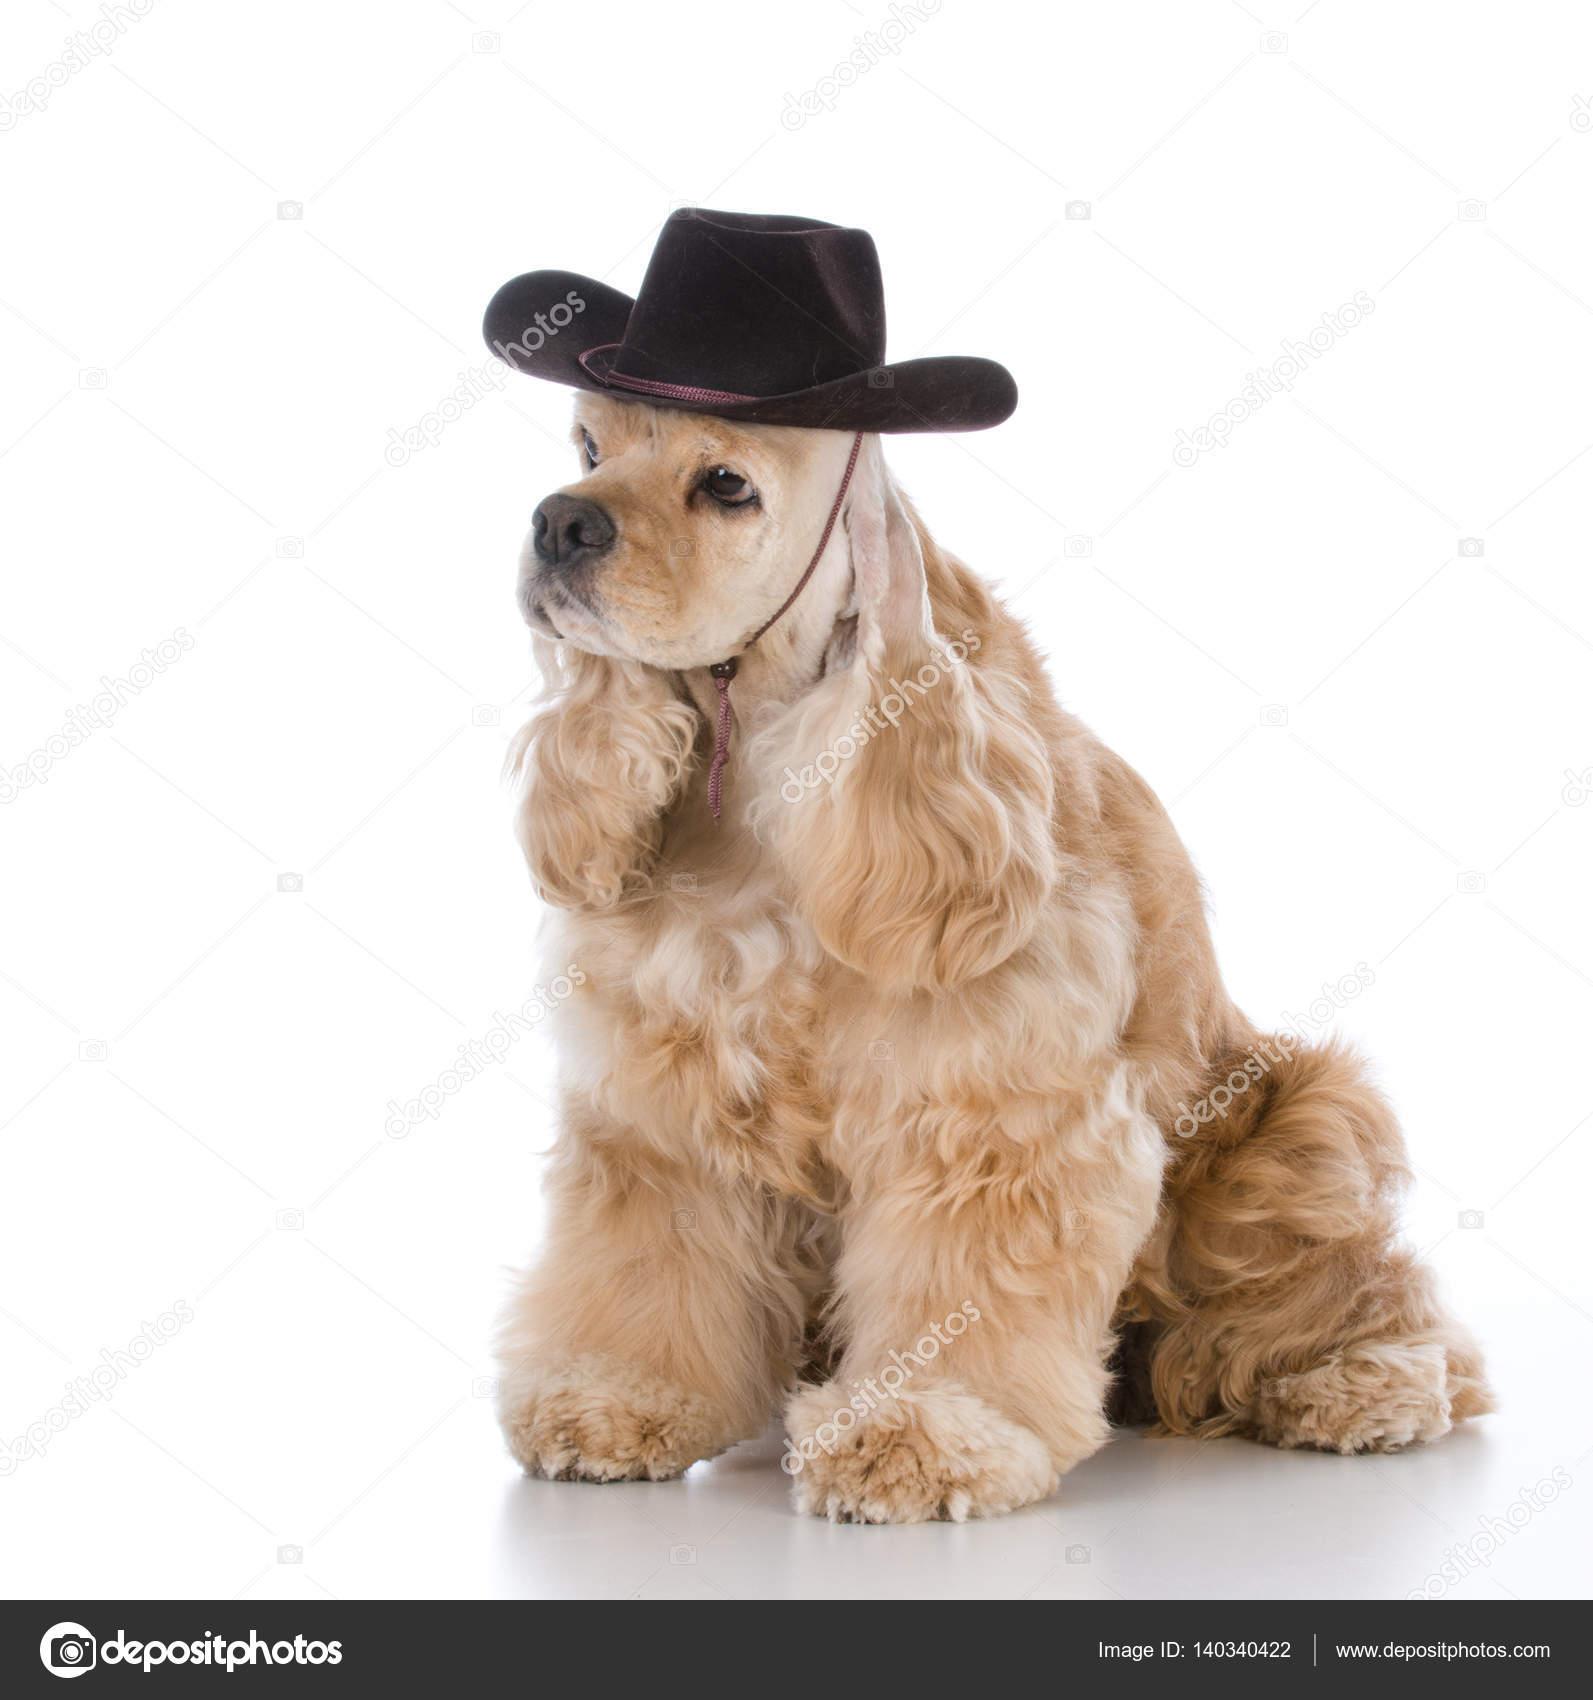 0c2c4b6e73565 Spanile Cocker con sombrero occidental sobre fondo blanco - sombreros  vaqueros para perros — Foto de willeecole — Foto de ...